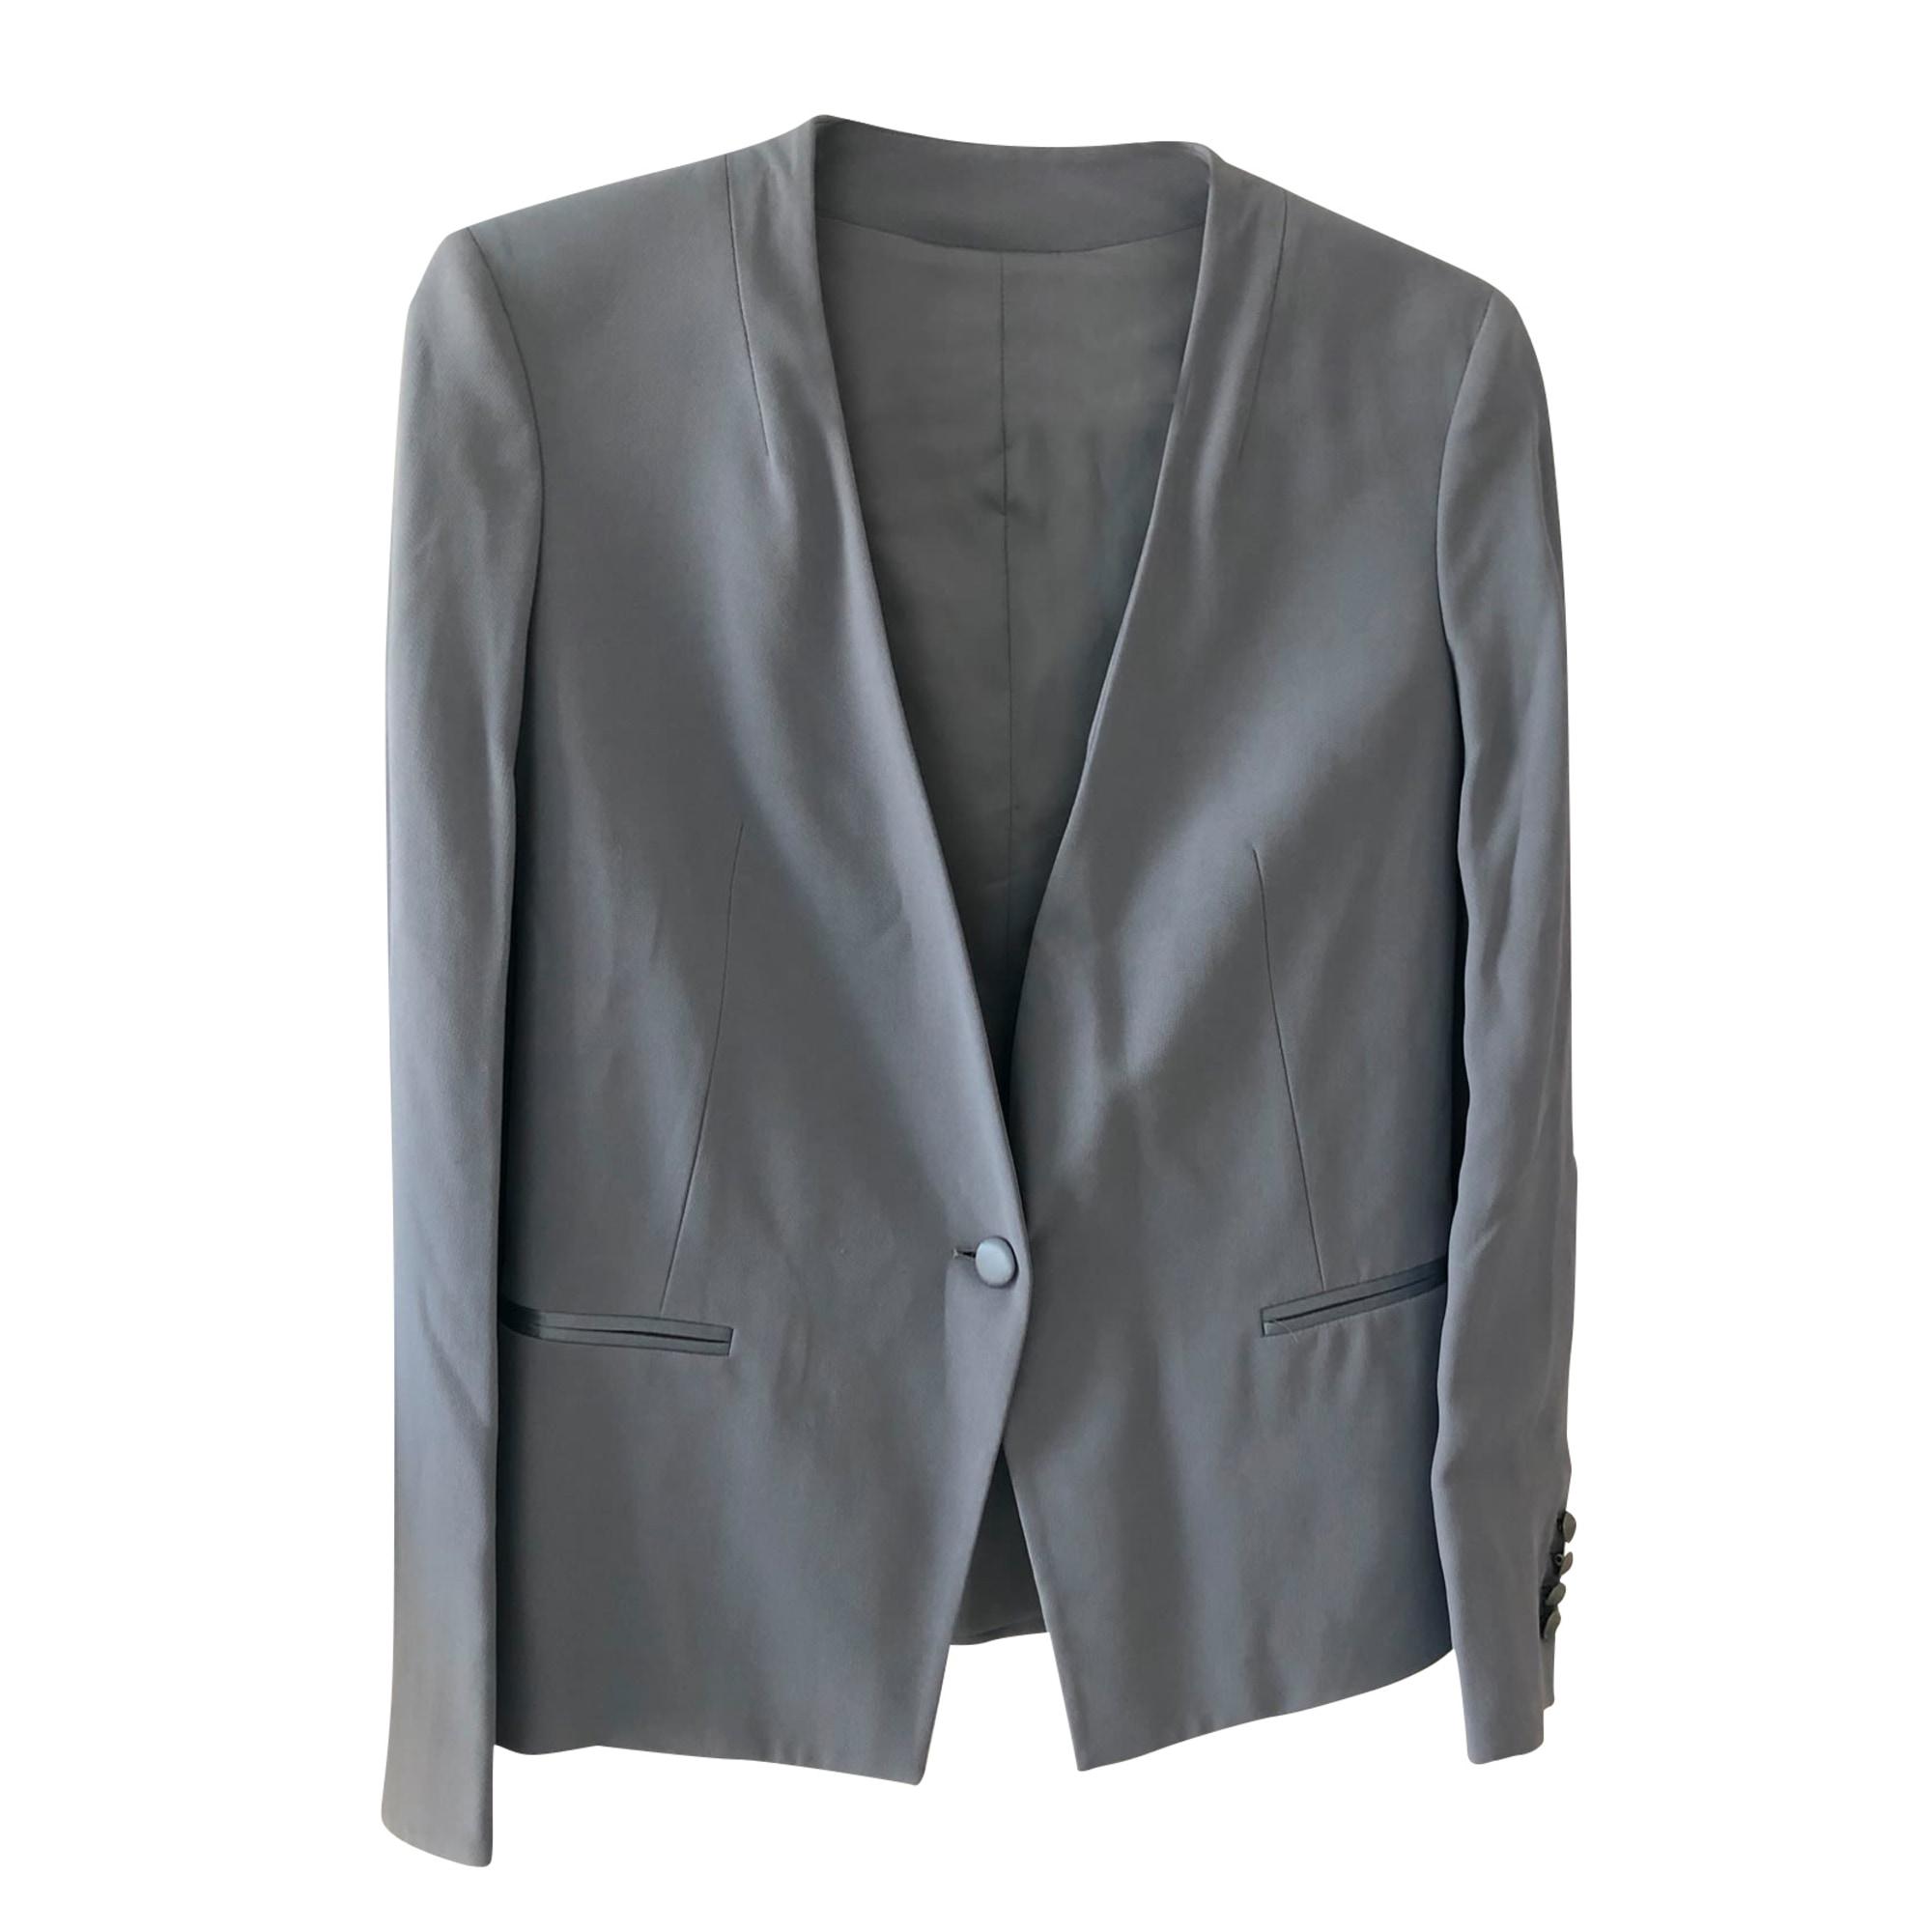 Blazer, veste tailleur THE KOOPLES Bleu, bleu marine, bleu turquoise